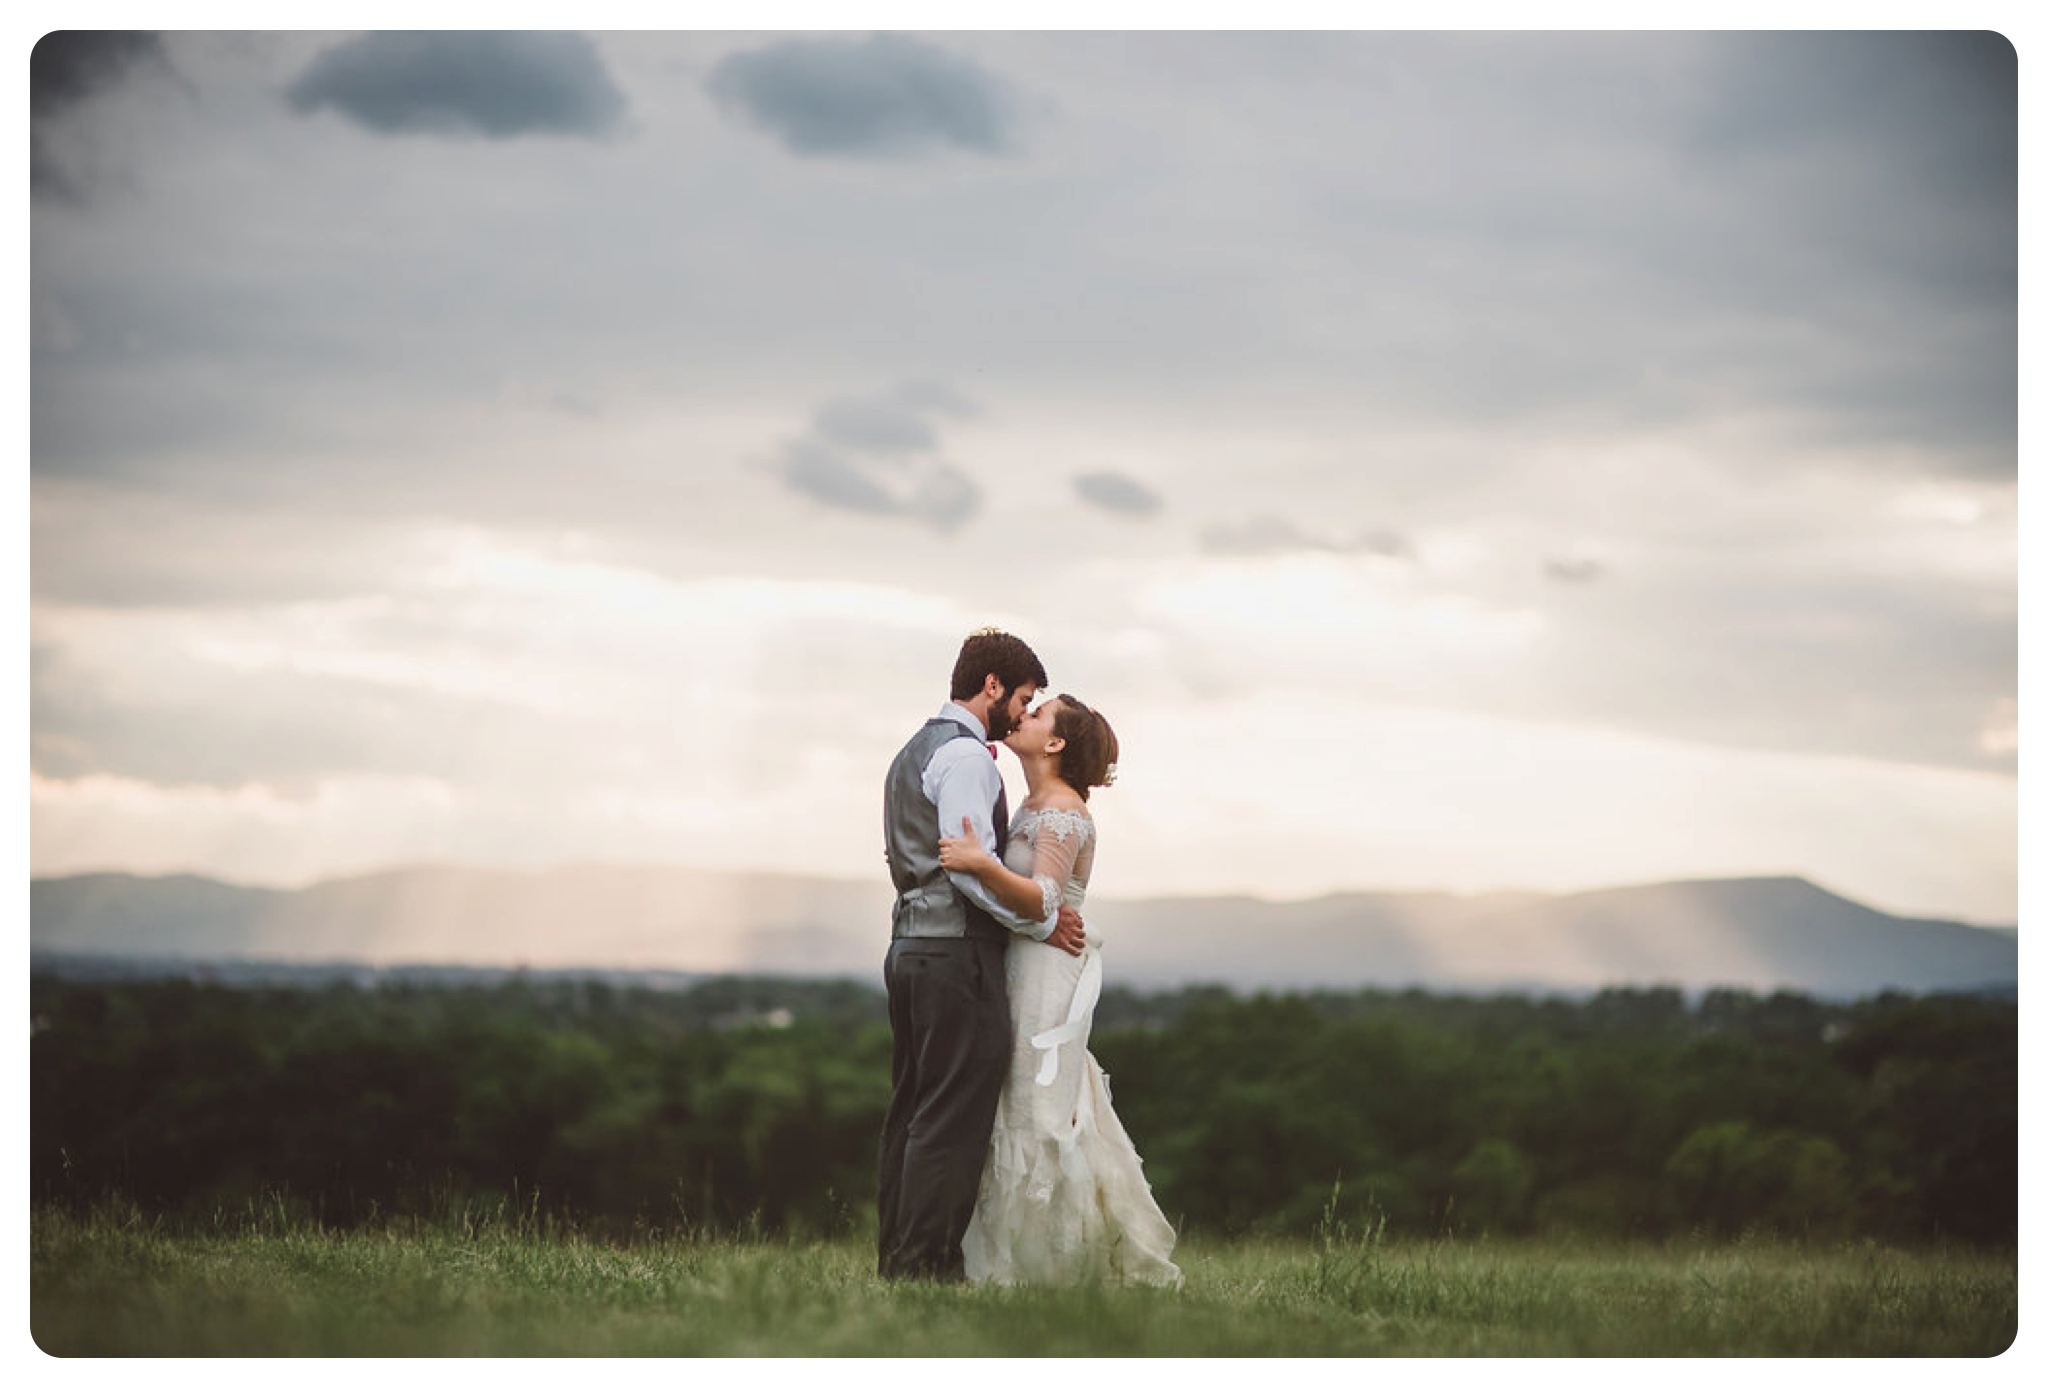 Braeloch-Weddings-Wedding-Photographer-Pat-Cori-Photography-031.jpg